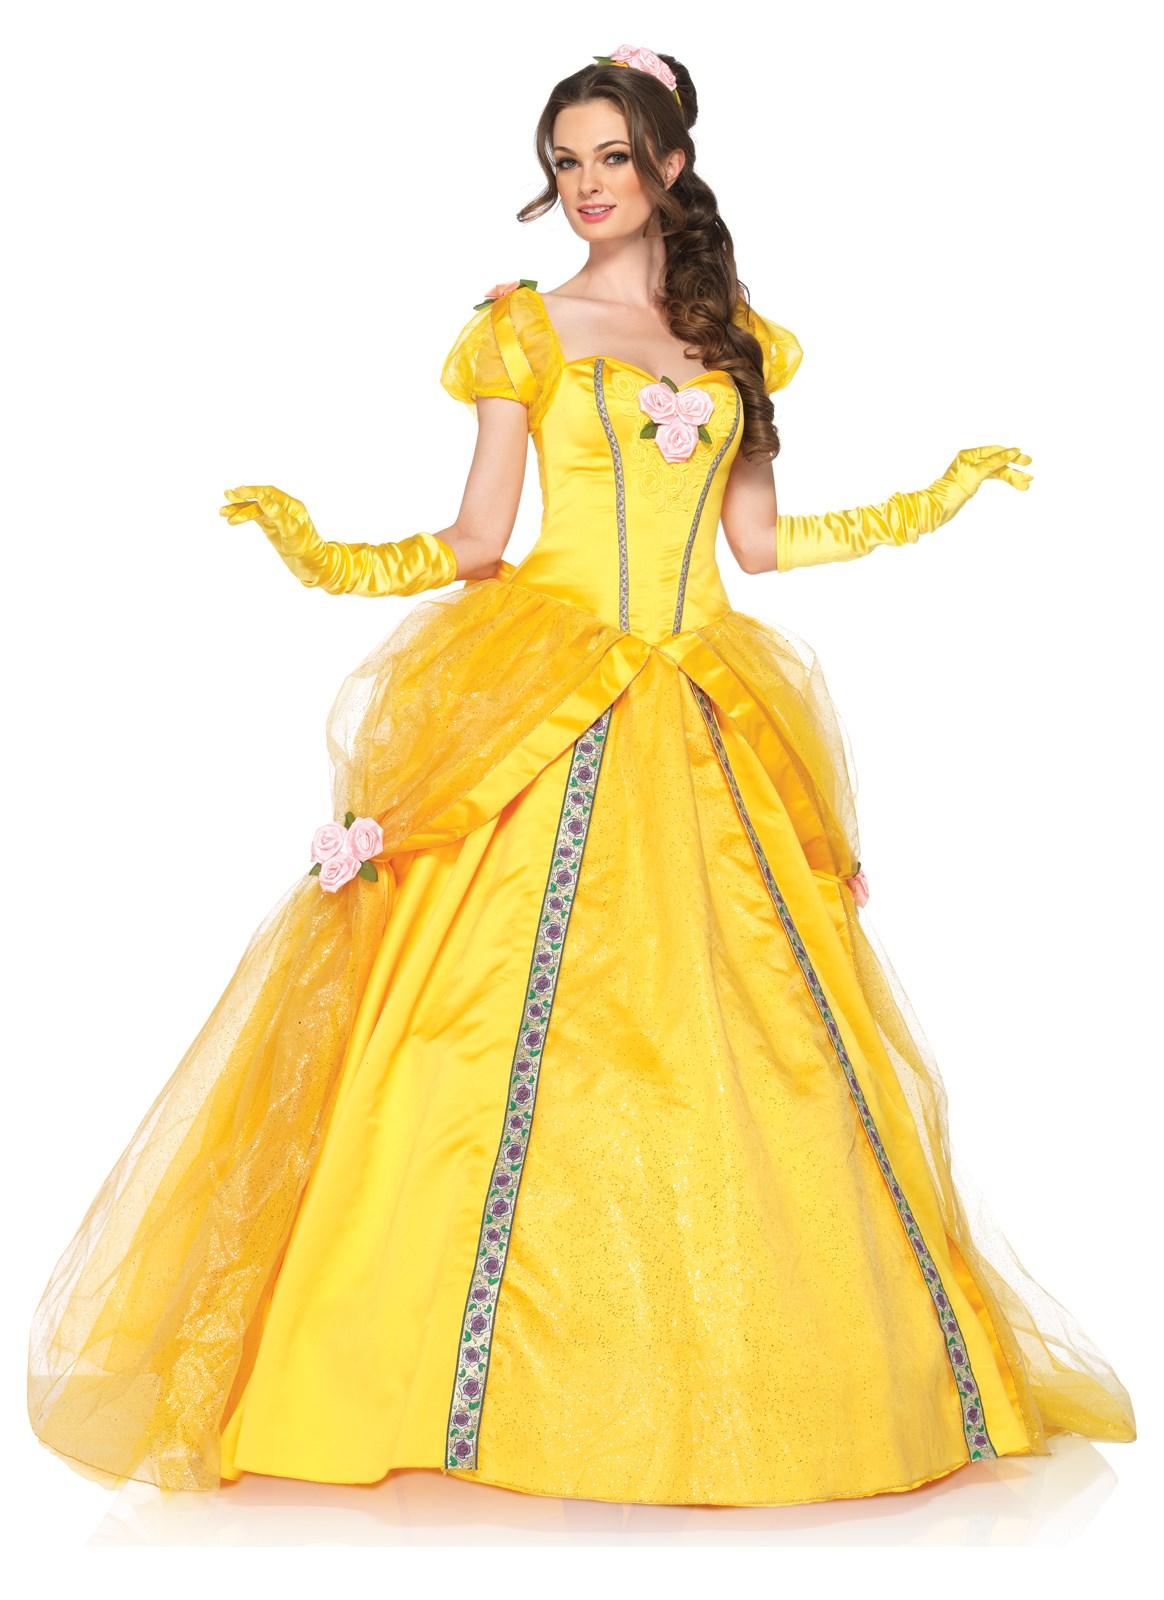 Disney princess gowns for adults - Default Image Disney Princesses Enchanting Belle Deluxe Adult Costume